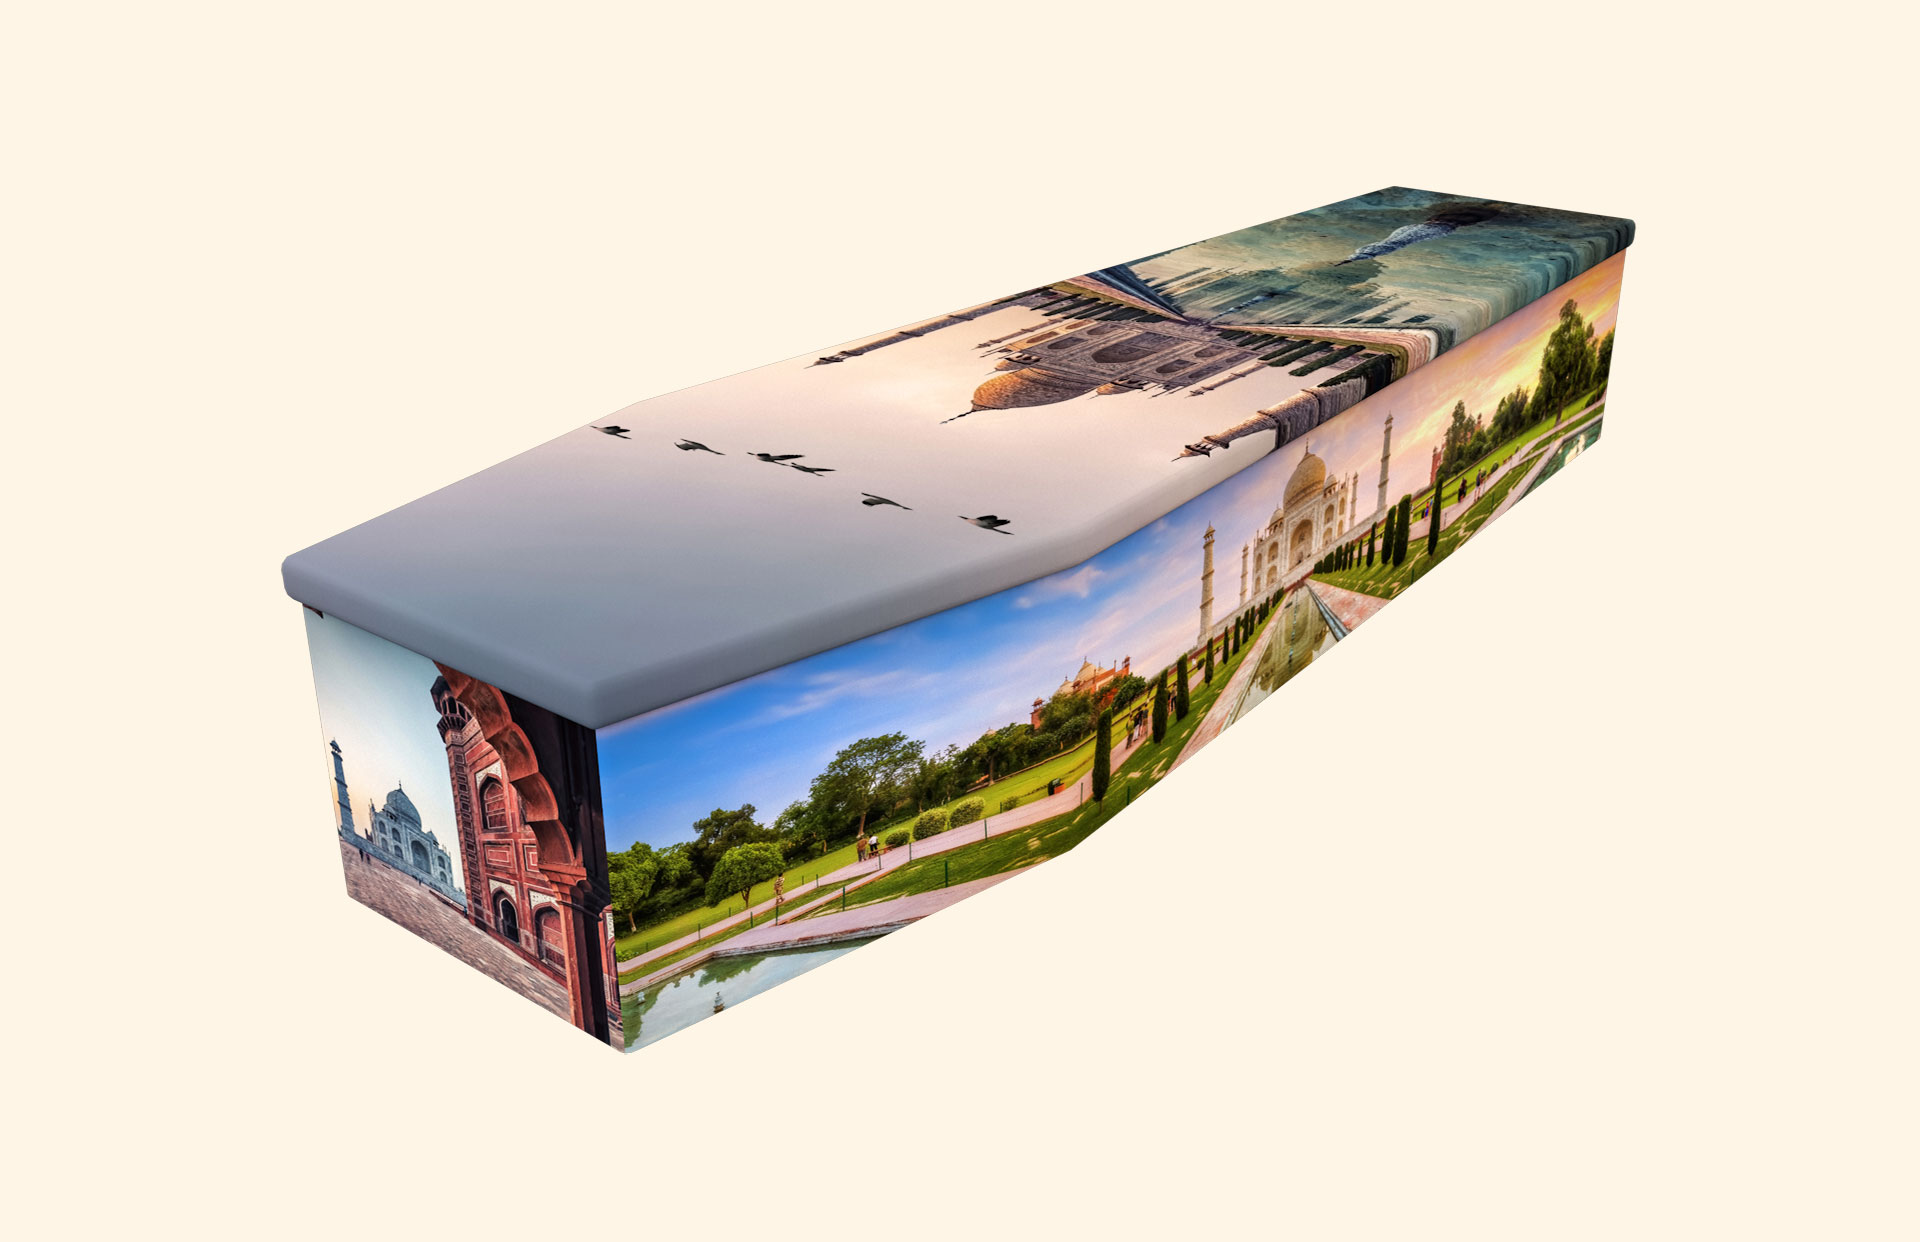 Taj Mahal cardboard coffin